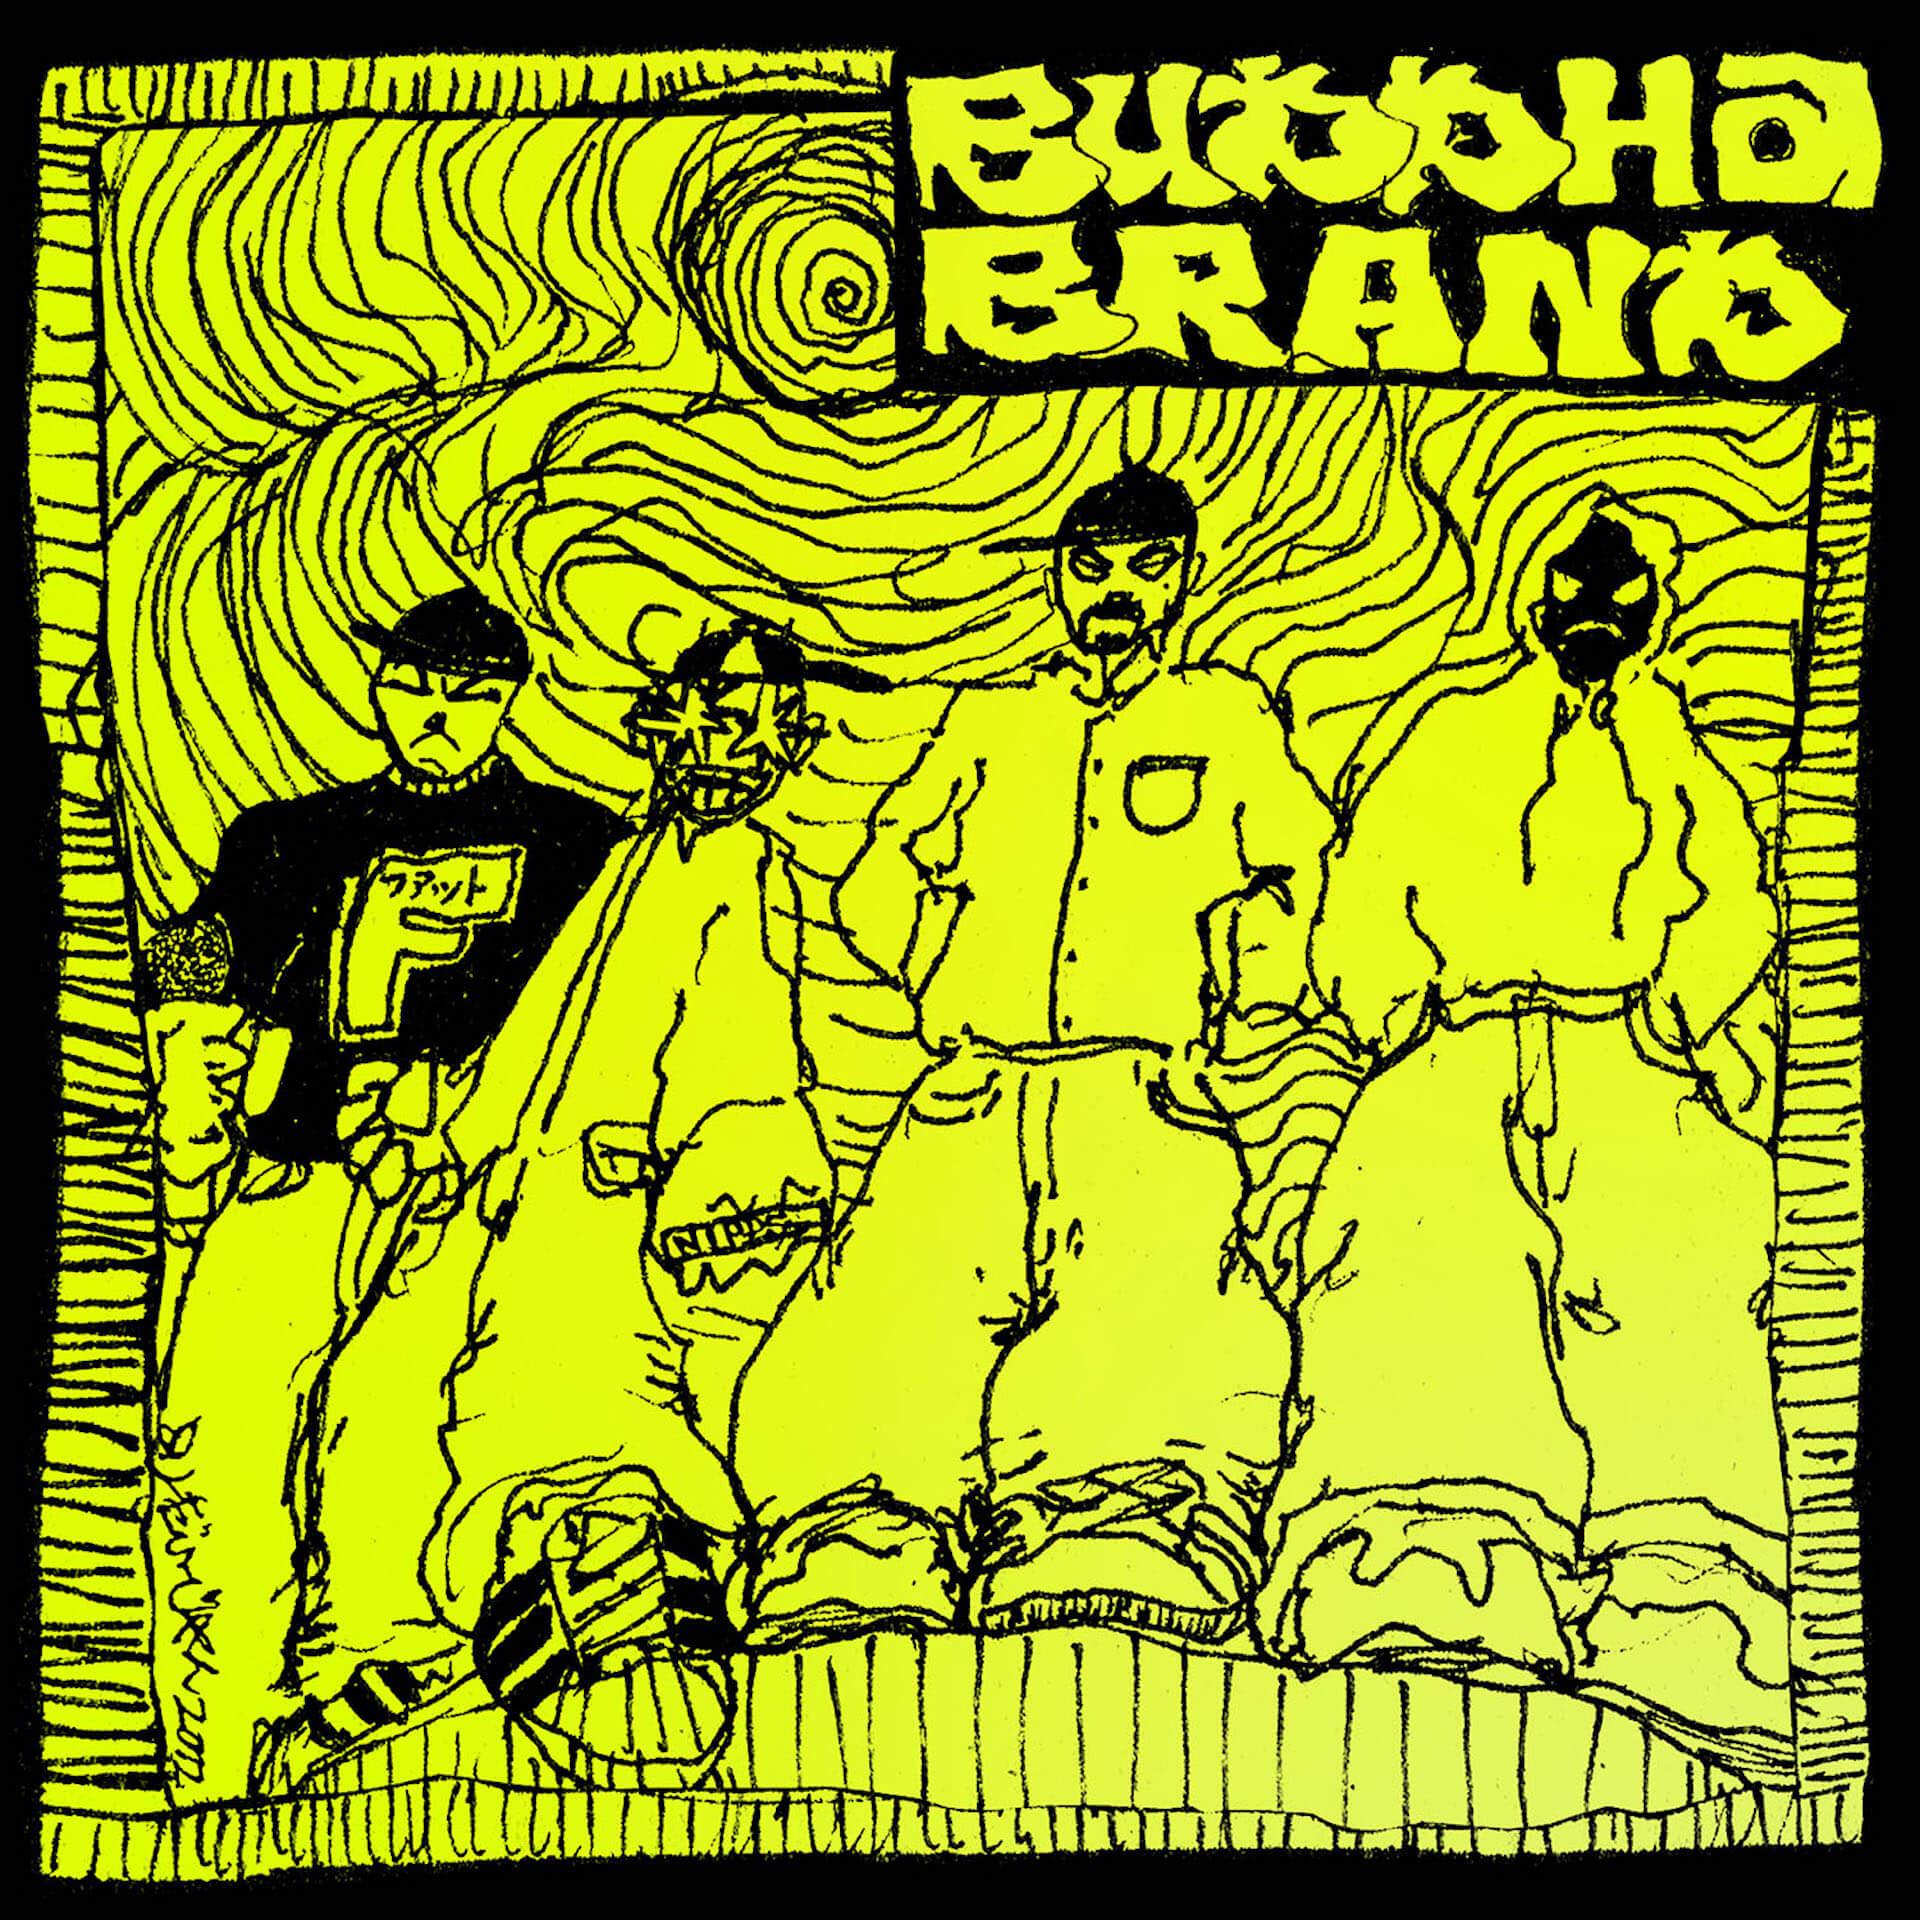 BUDDHA BRAND、10月発売のニューアルバム『コレがブッダブランド!』のアートワークが公開 music190926-buddha-brand-2